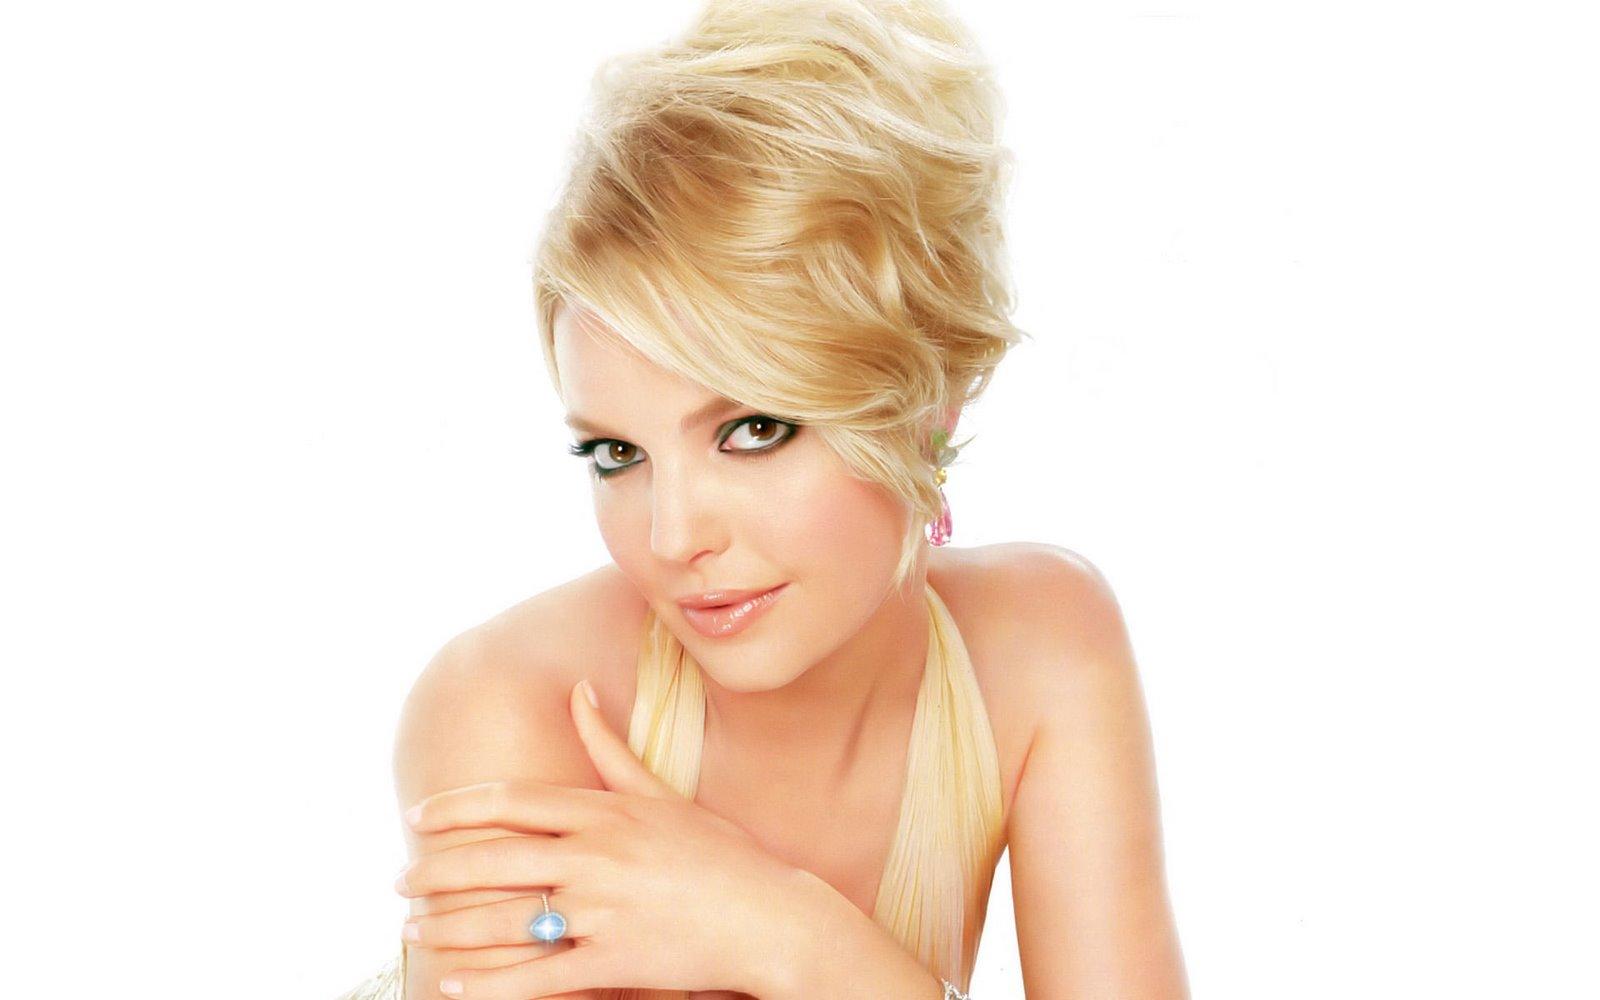 http://3.bp.blogspot.com/_wbwa1vp0yj8/R2_VGX6gJRI/AAAAAAAAAZw/eyp8tvABhHU/s1600/katherine-heigl-beautiful-face-01u.jpg